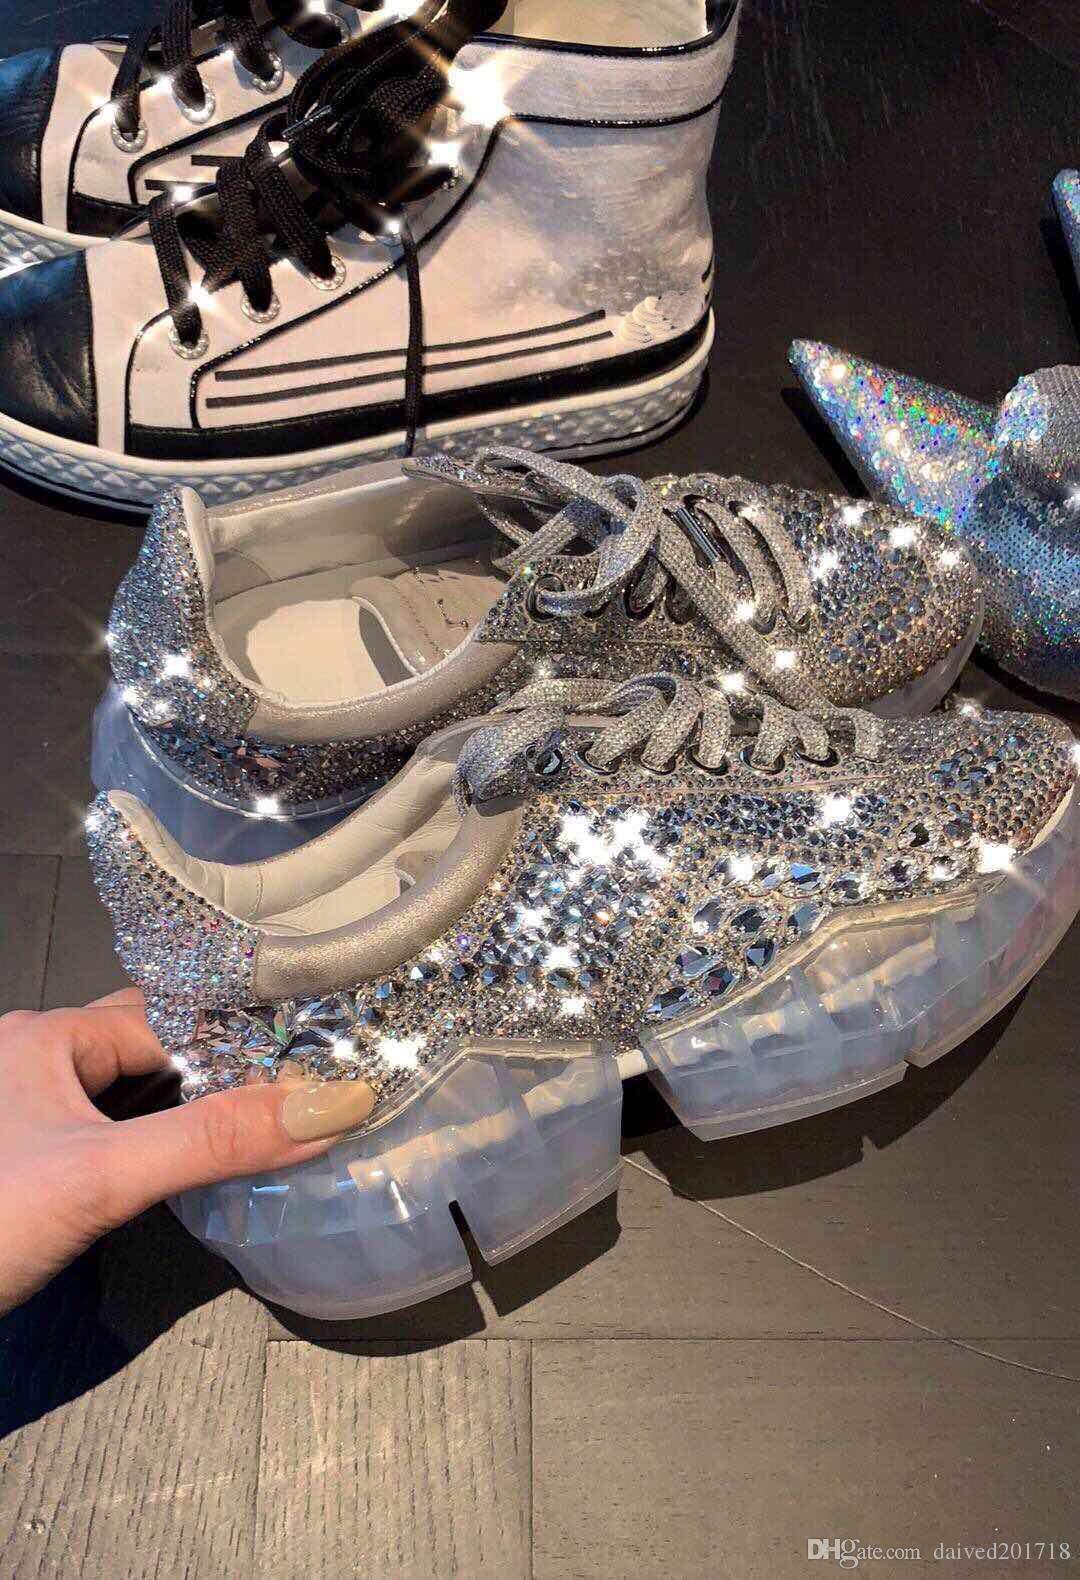 European luxury style Casual shoes fashionhot sale suede basket heart satin flat shoes Crystal Diamond Decoration, Fashionable Sexy Leisure